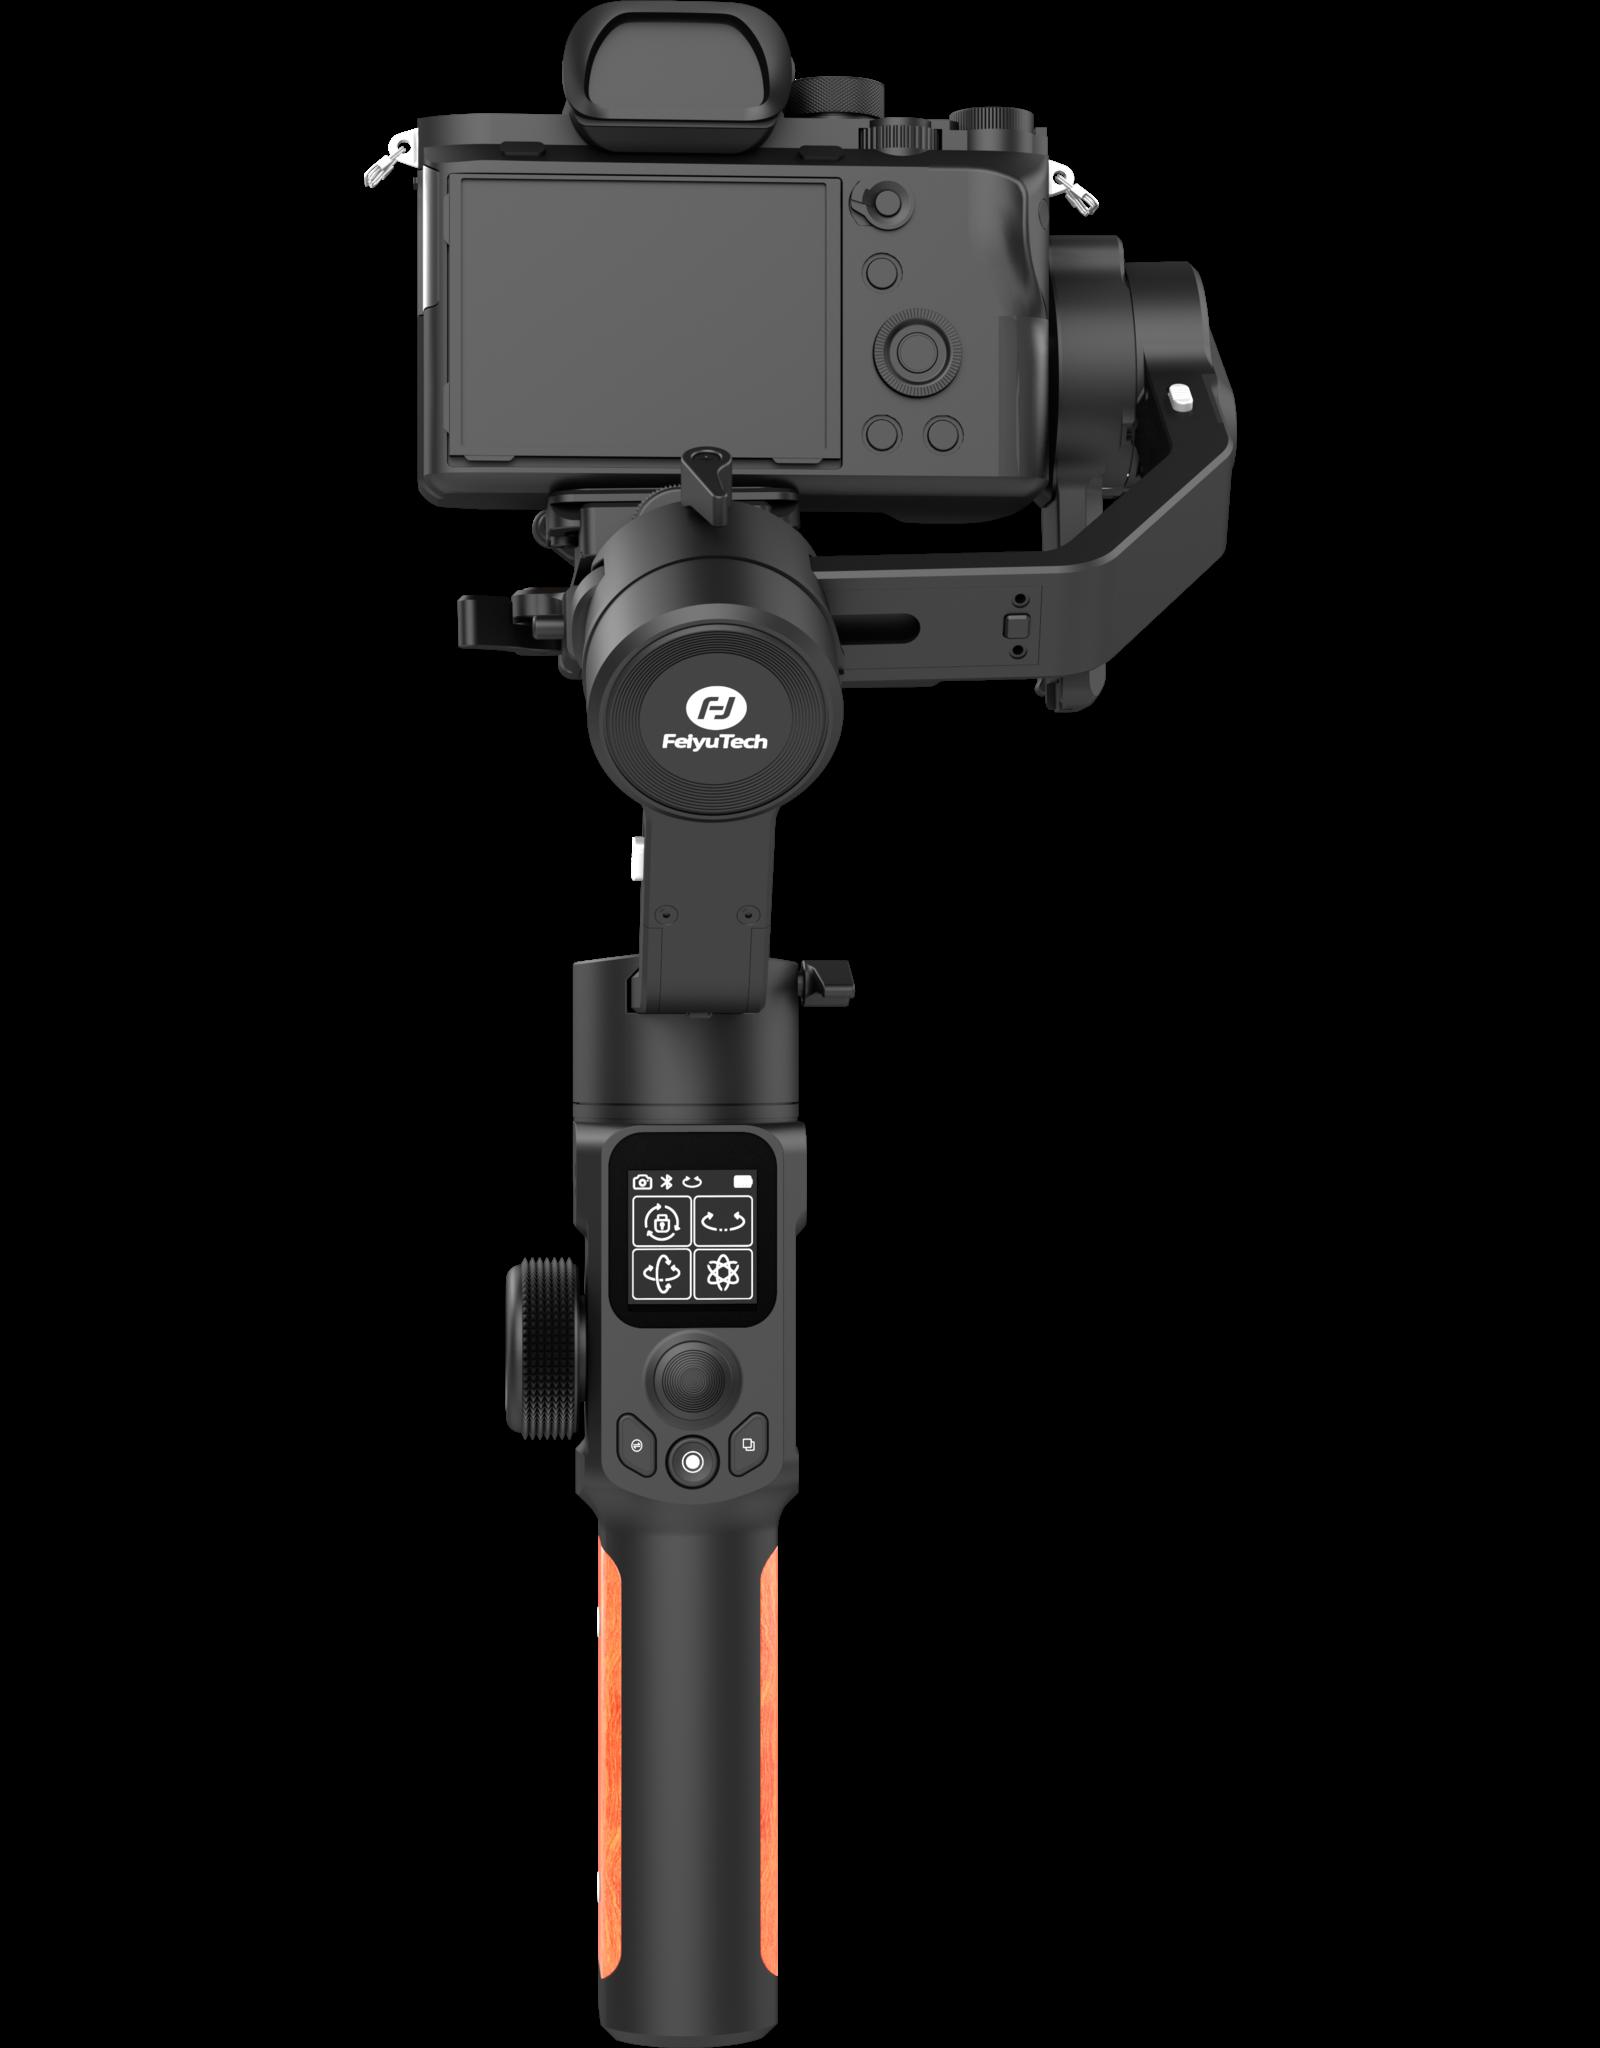 Feiju Tech FeiyuTech 3-Axis Stabilized Handheld Gimbal  AK2000s